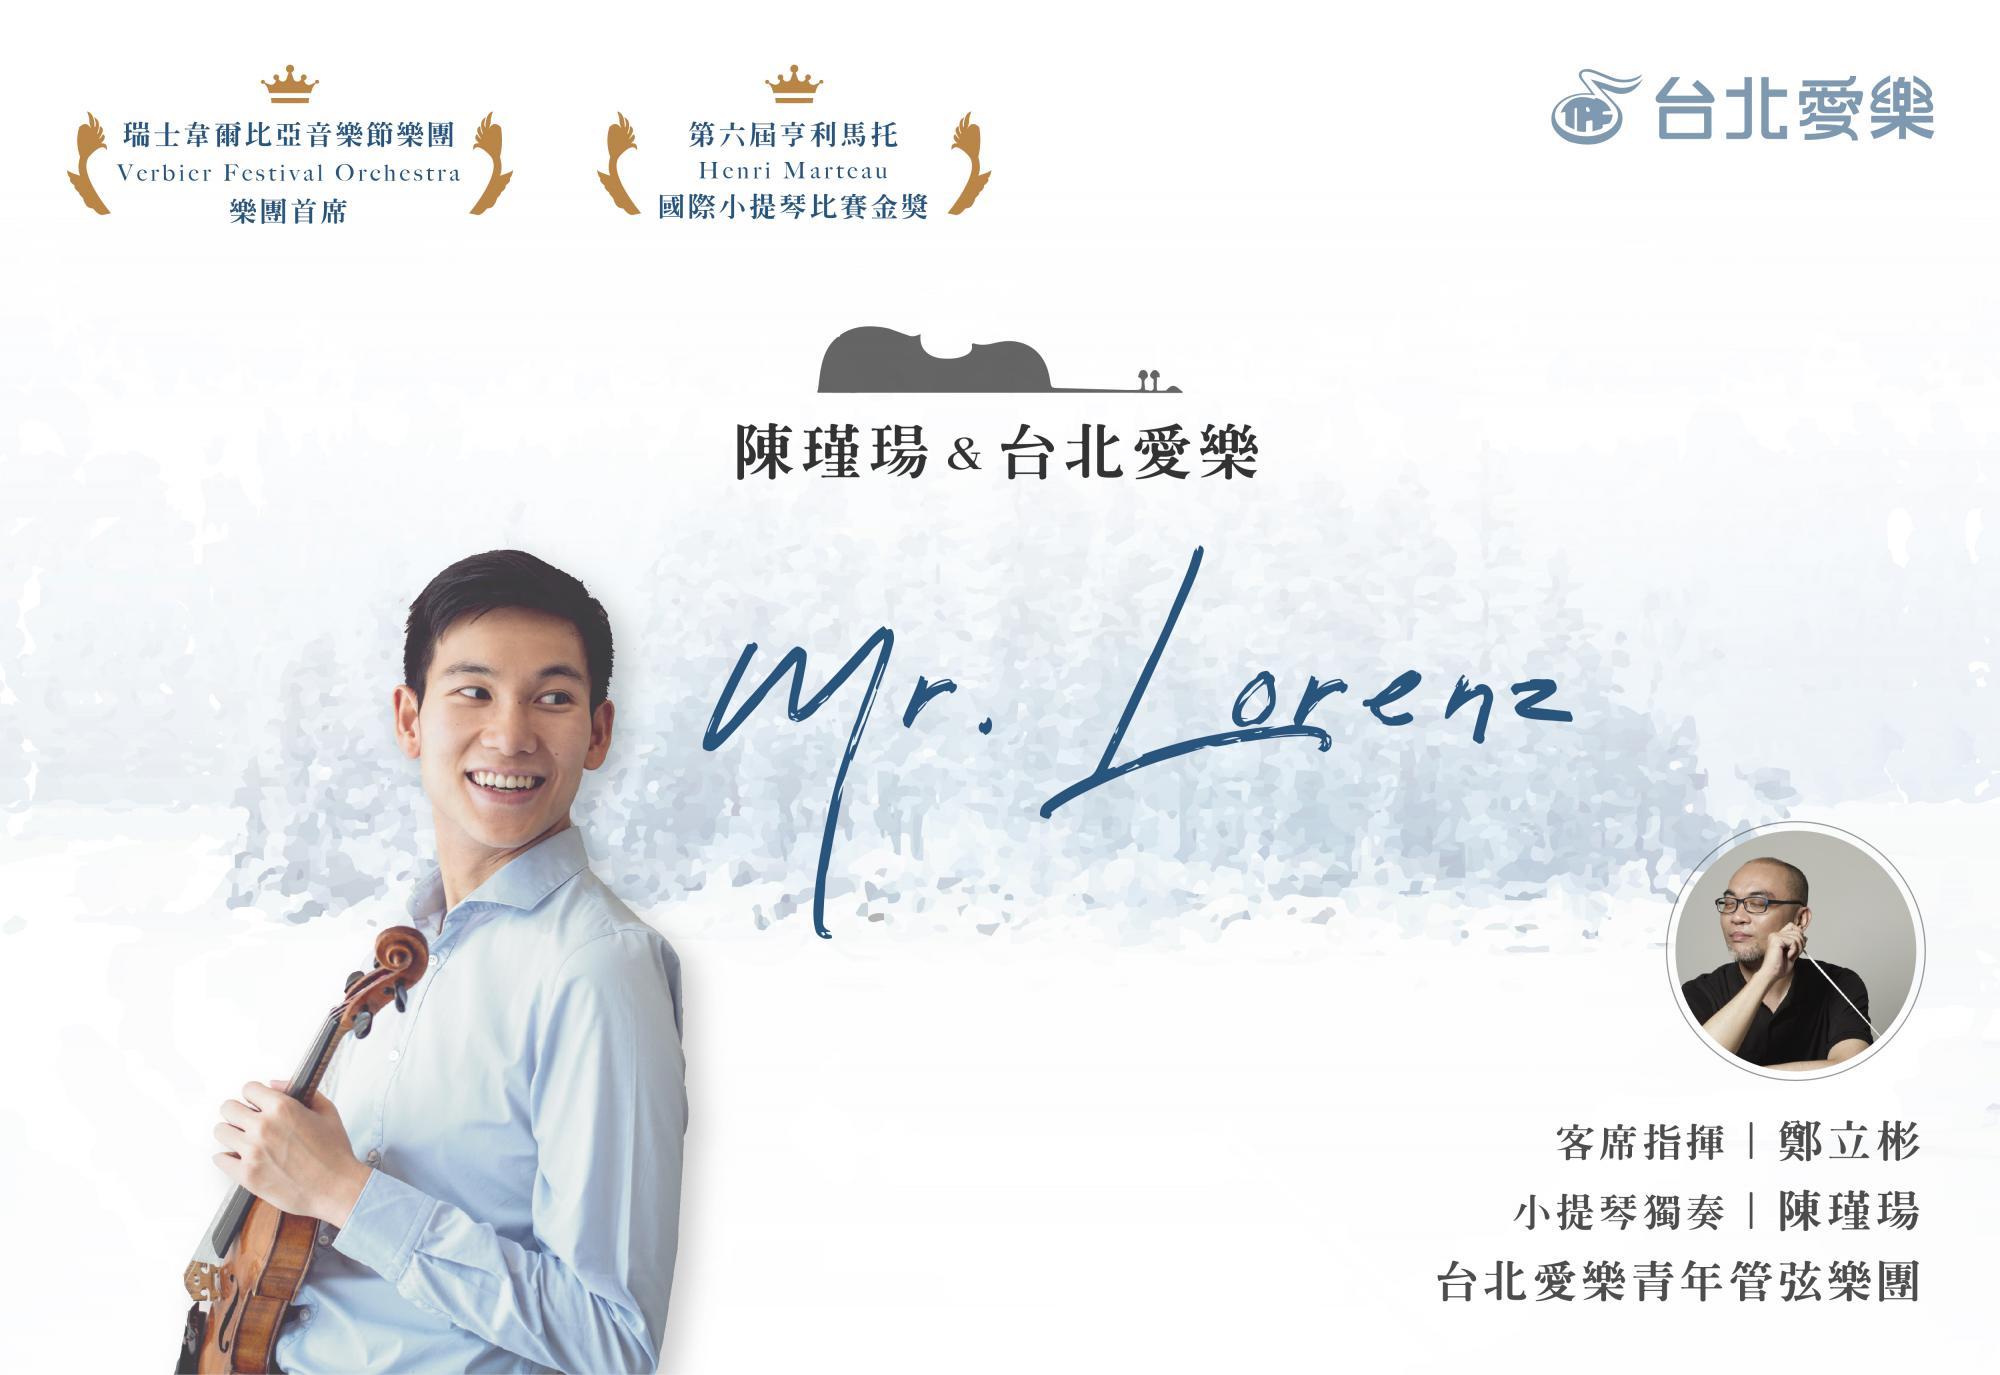 12/25 Mr. Lorenz-陳瑾瑒&台北愛樂